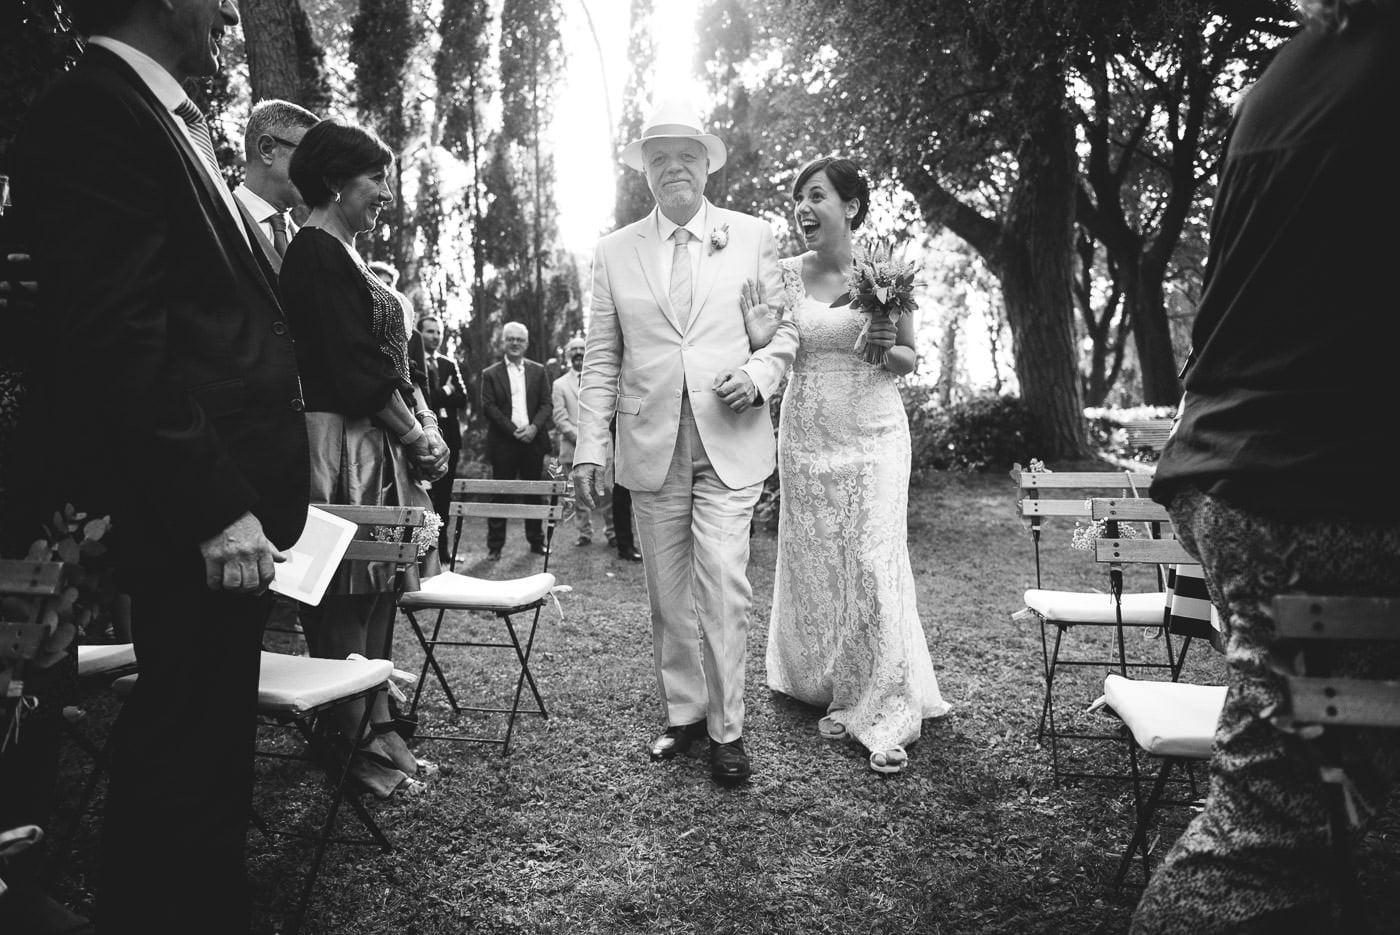 Matrimonio Giulia & Federico 09_15 – Alessio Nobili Photographer-25